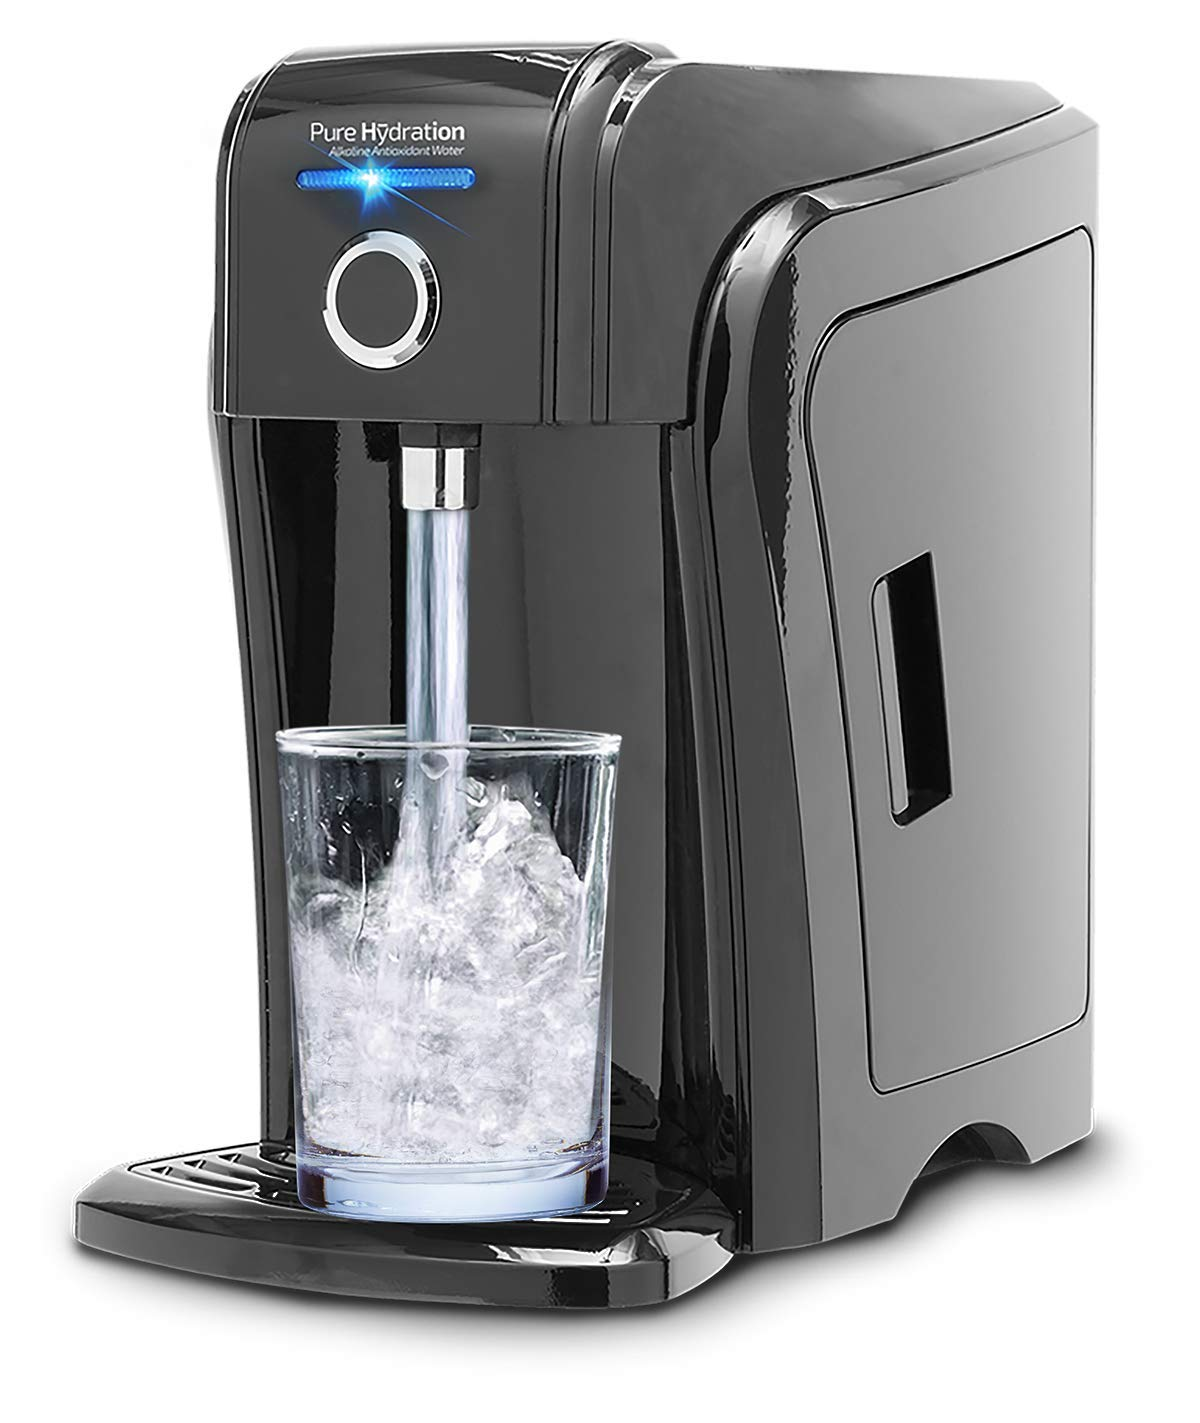 Pure Hydration Alkaline Antioxidant Water Ionizer by Cosan:USA